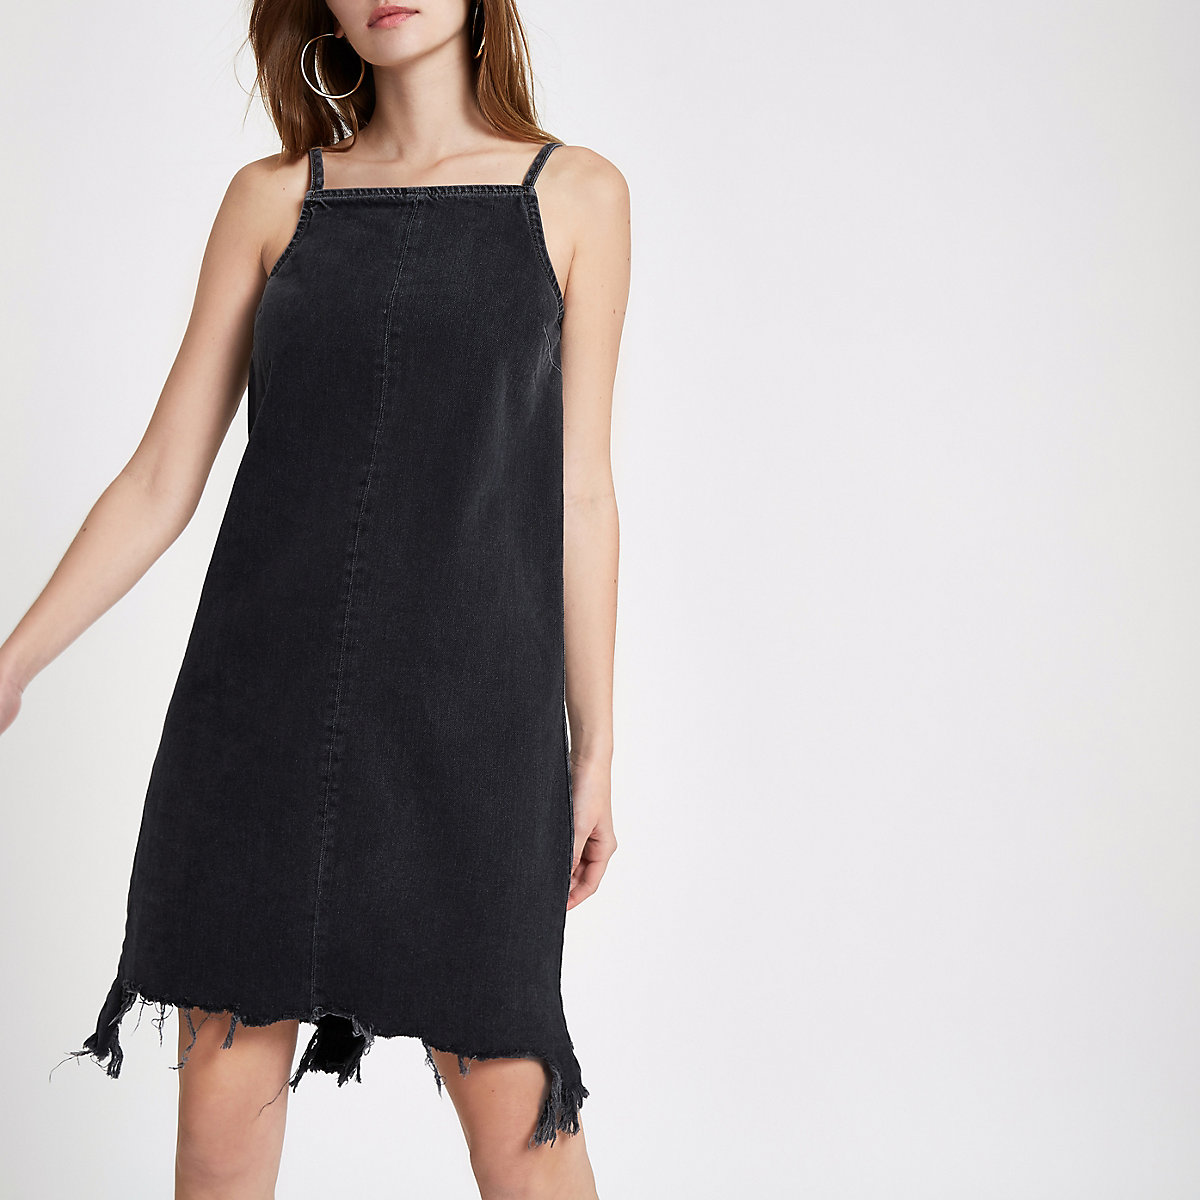 Zwarte wash denim jurk met gerafelde zoom